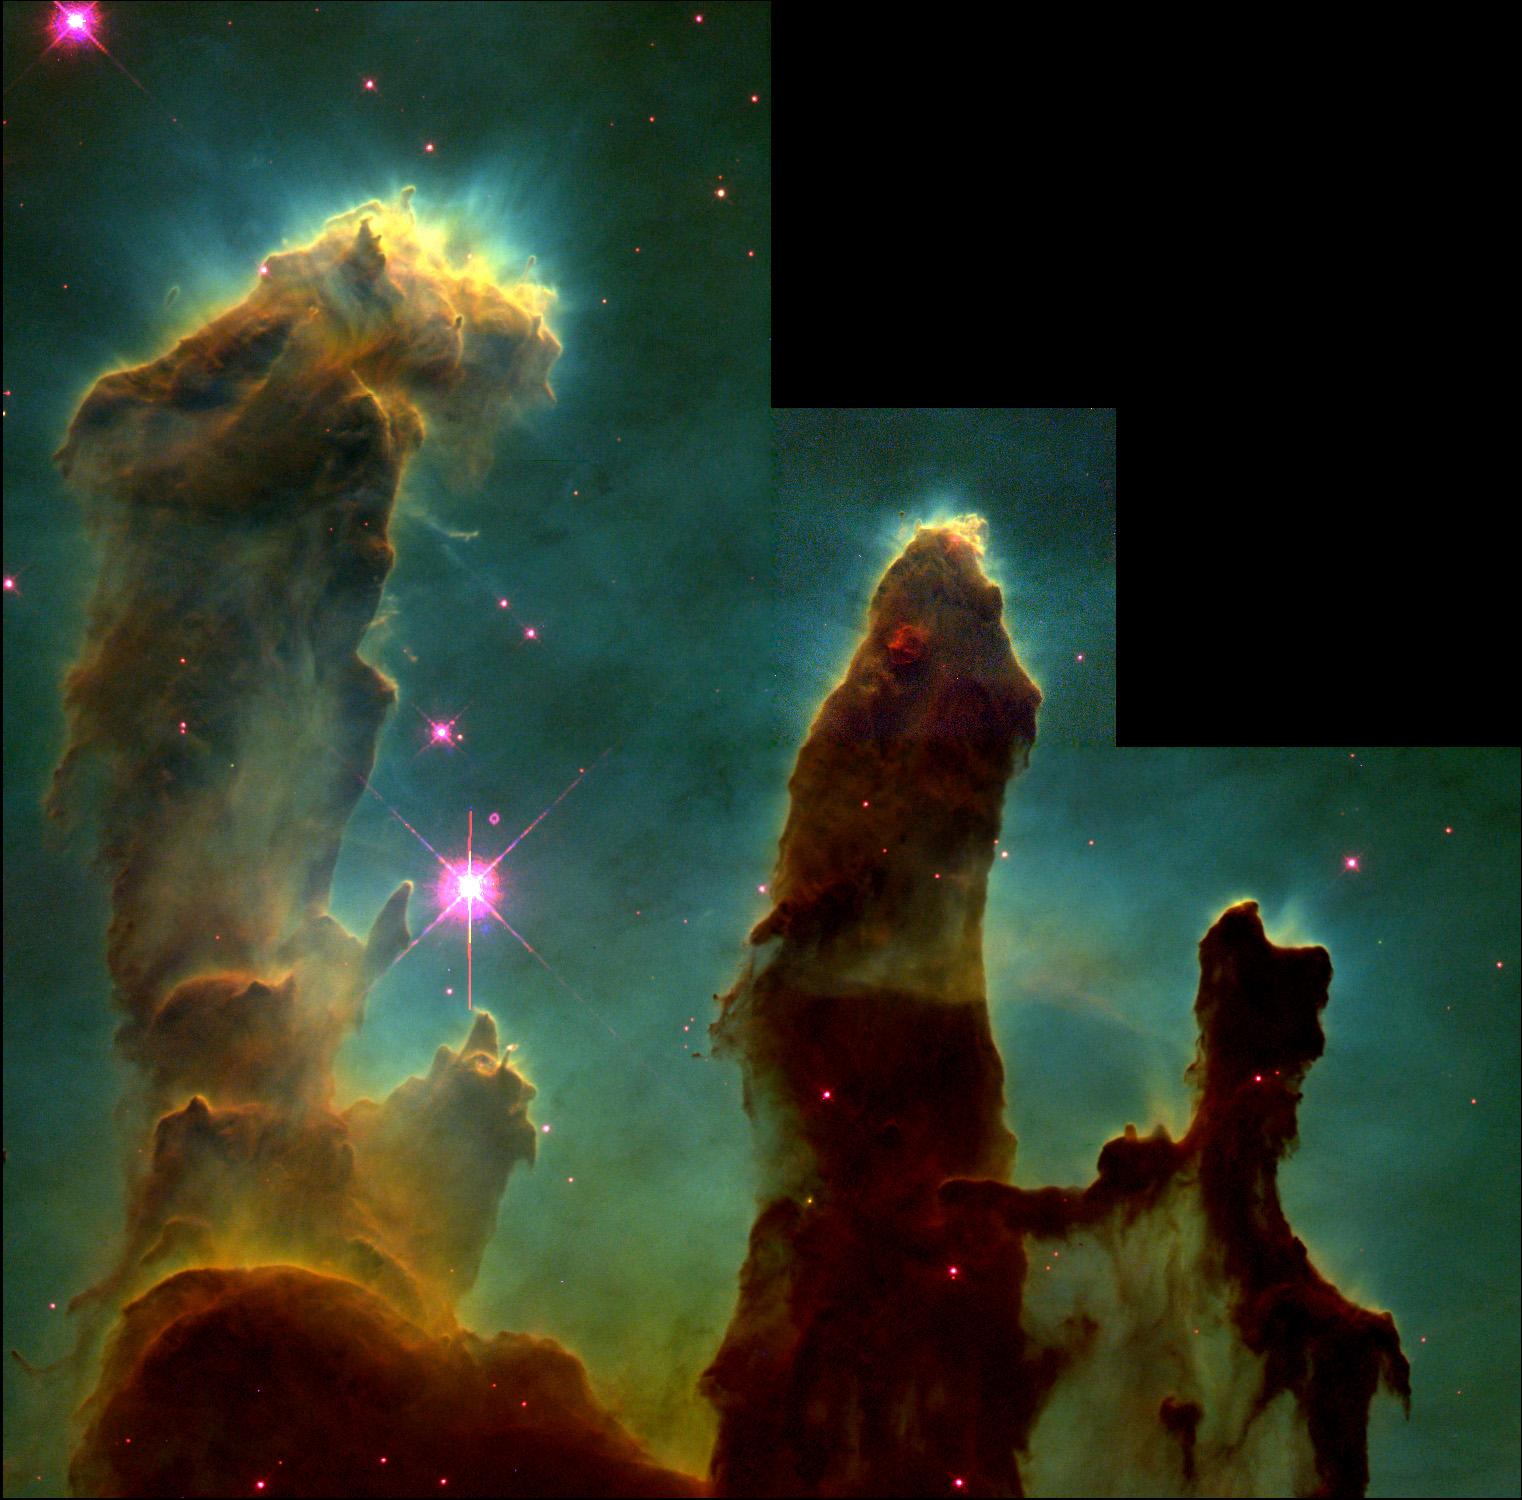 The Pillars of Creation as seen by Hubble Credits: NASA/ESA/STScI, Hester & Scowen (Arizona State University)